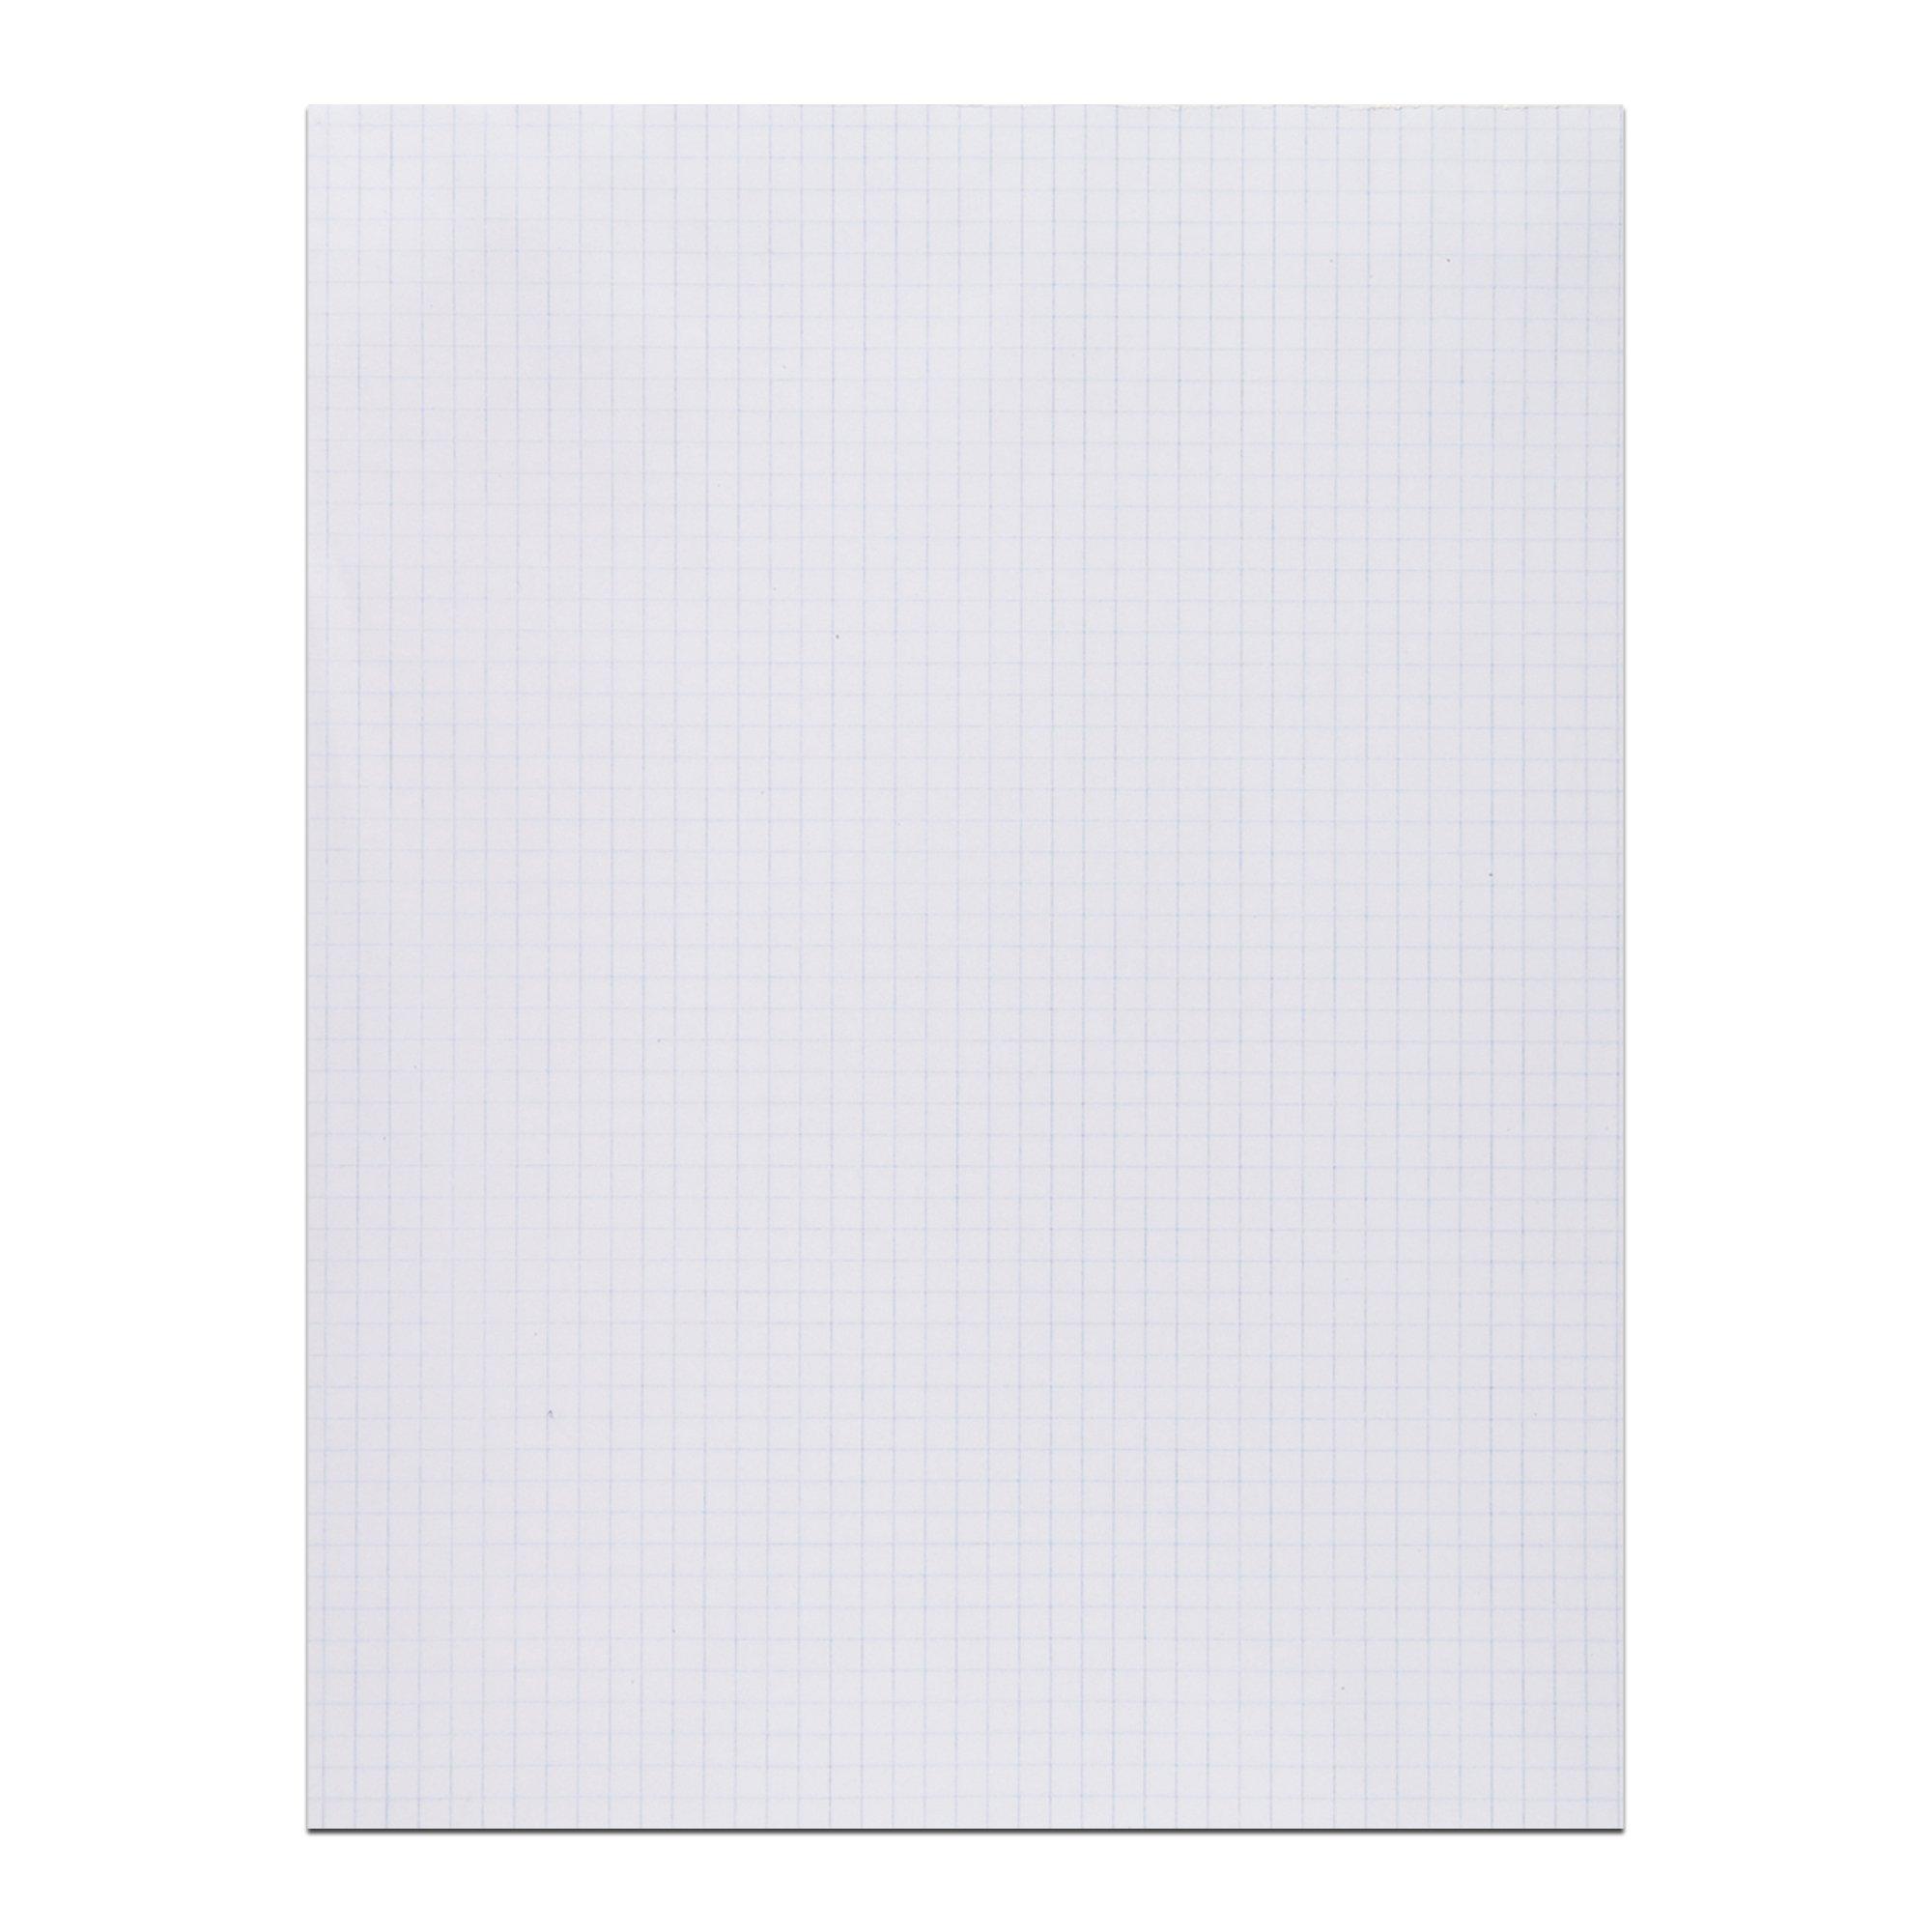 Roaring Spring Gummed Pad, 8.5'' x 11'', White, 5x5 Graph